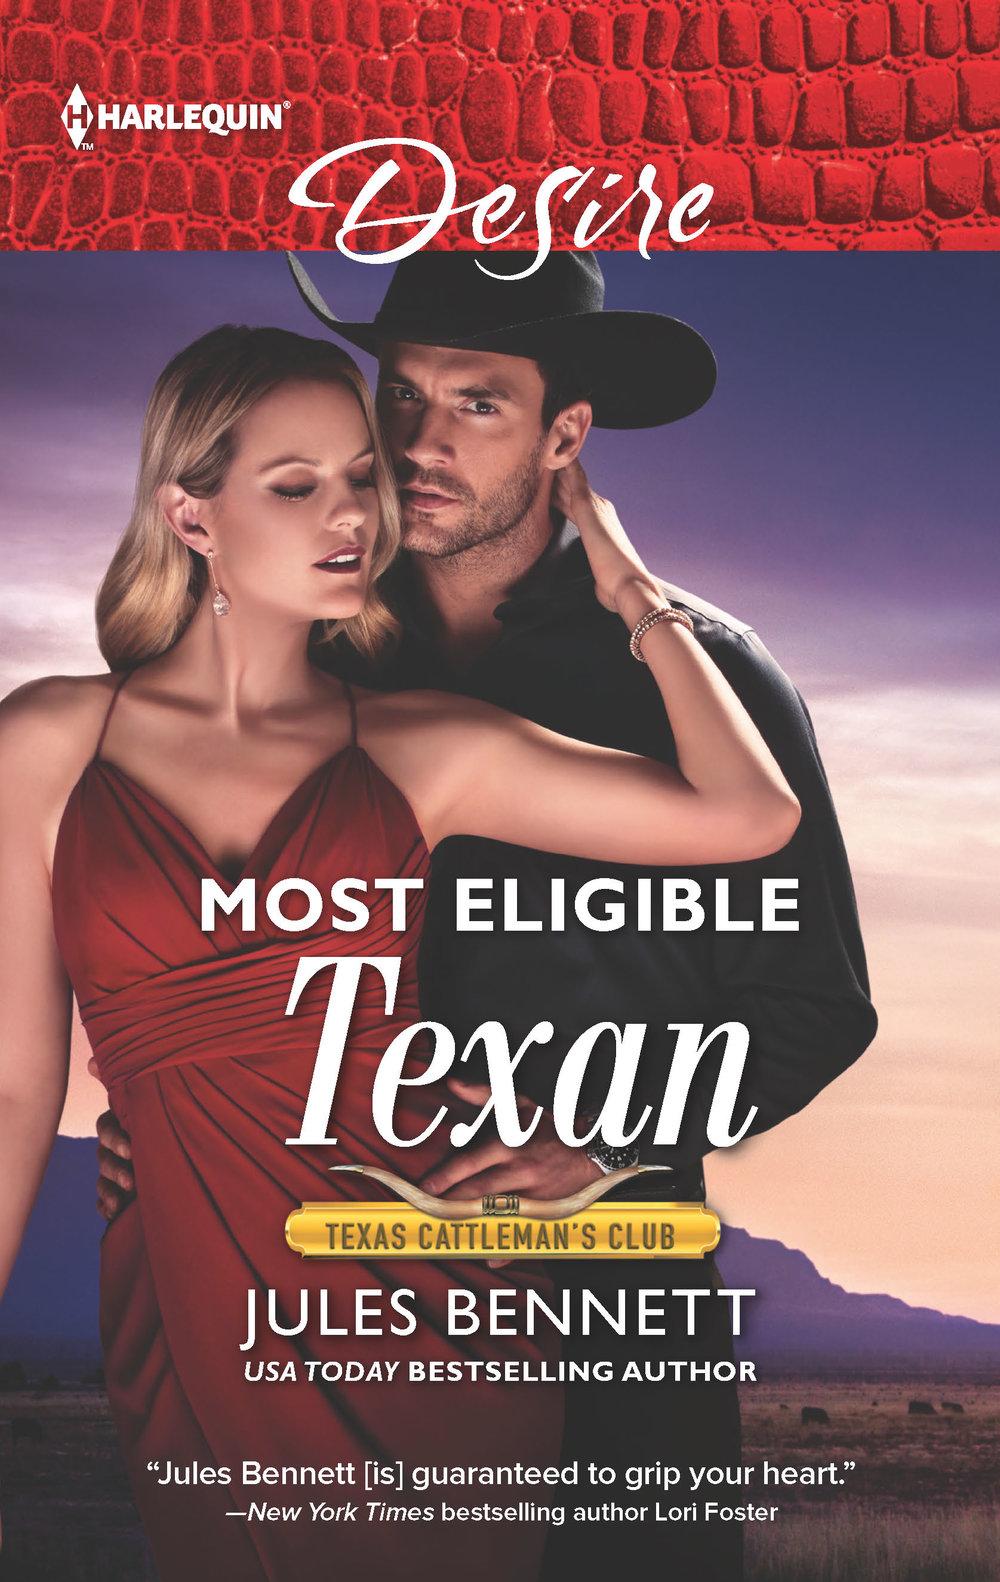 Jules Bennett Most Eligible Texan.jpg